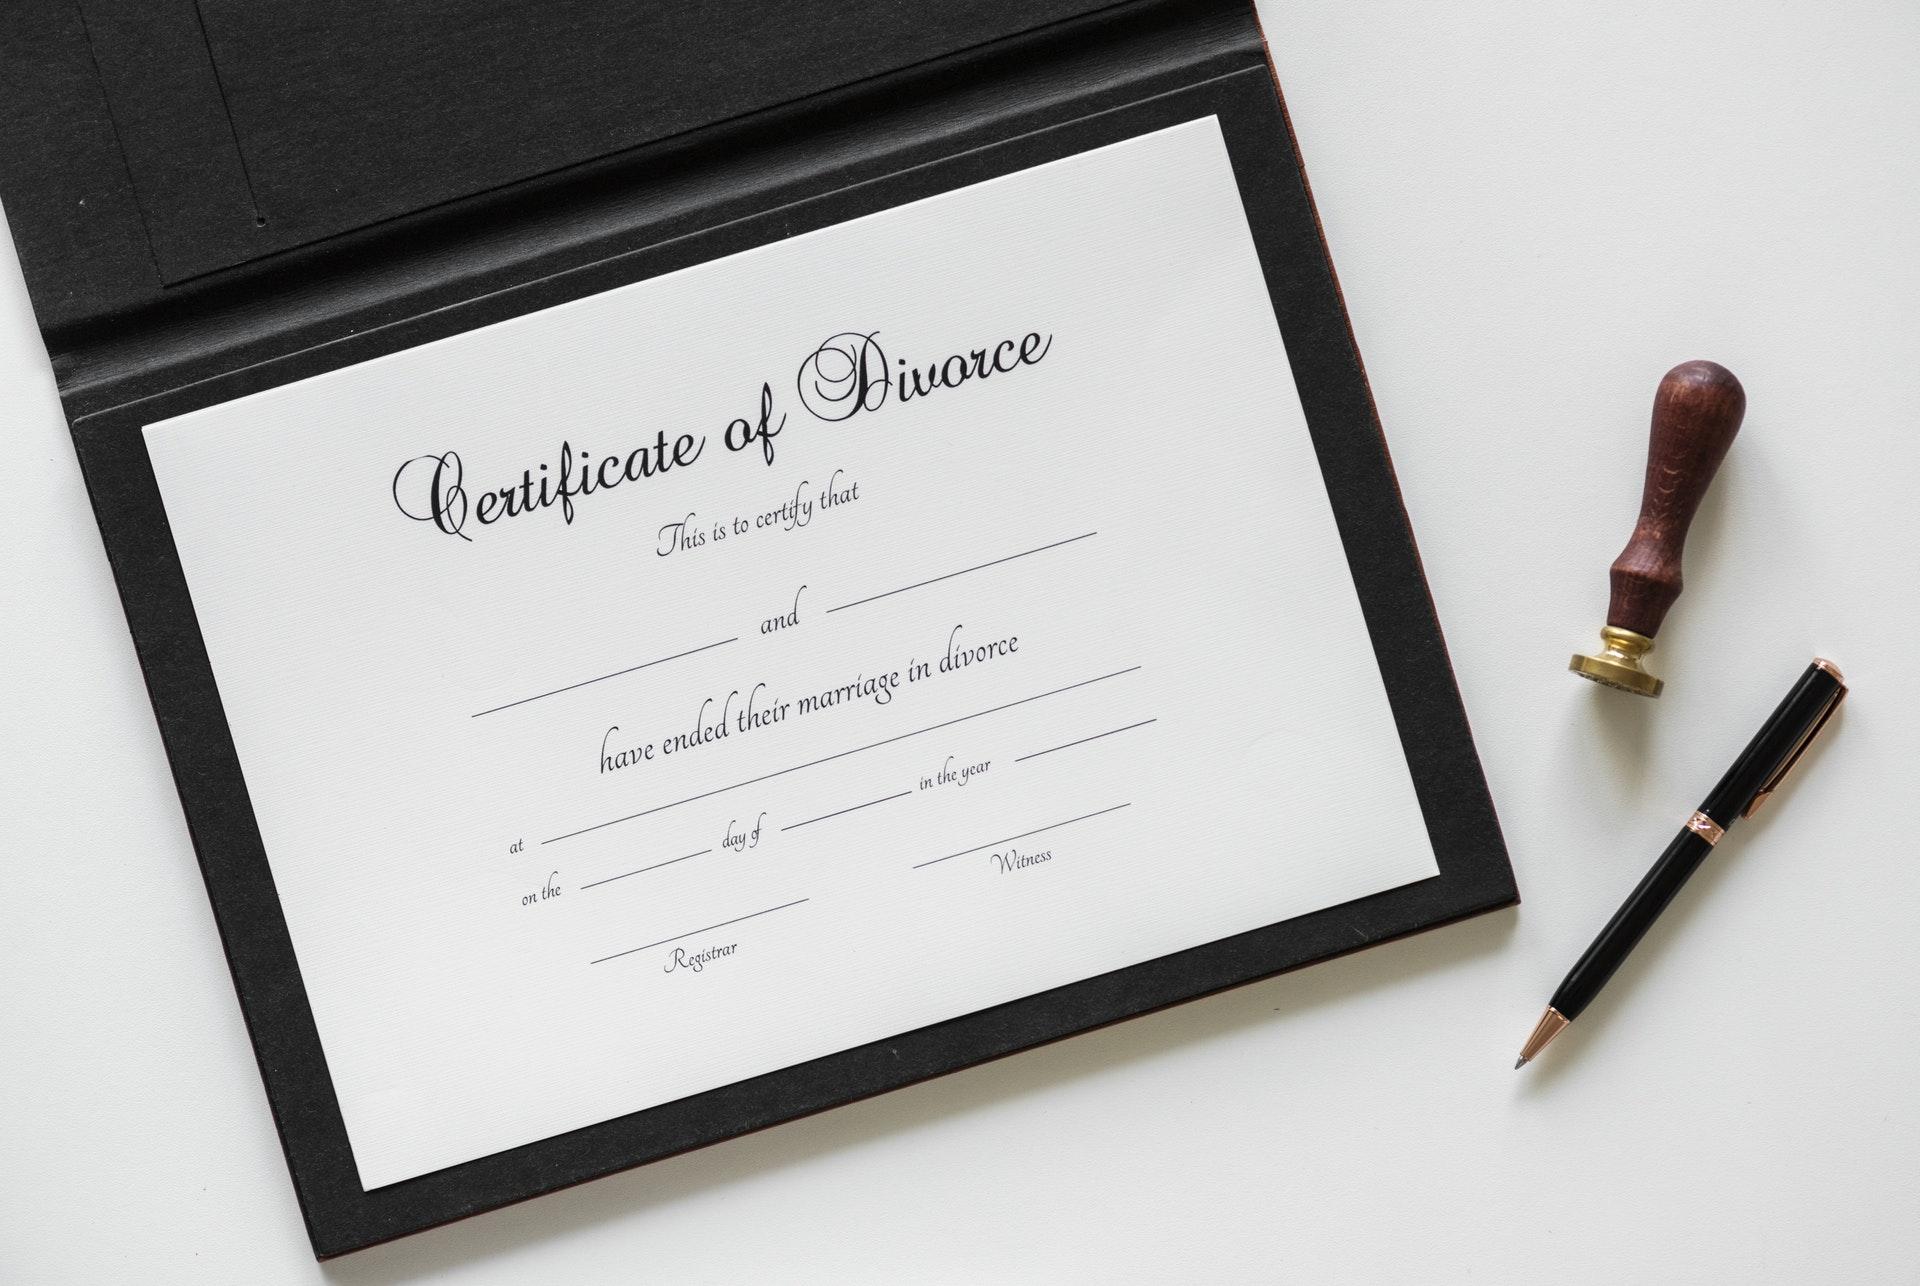 Jamaica Divorce Application Form, Obtain A Divorce In Jamaica, Jamaica Divorce Application Form